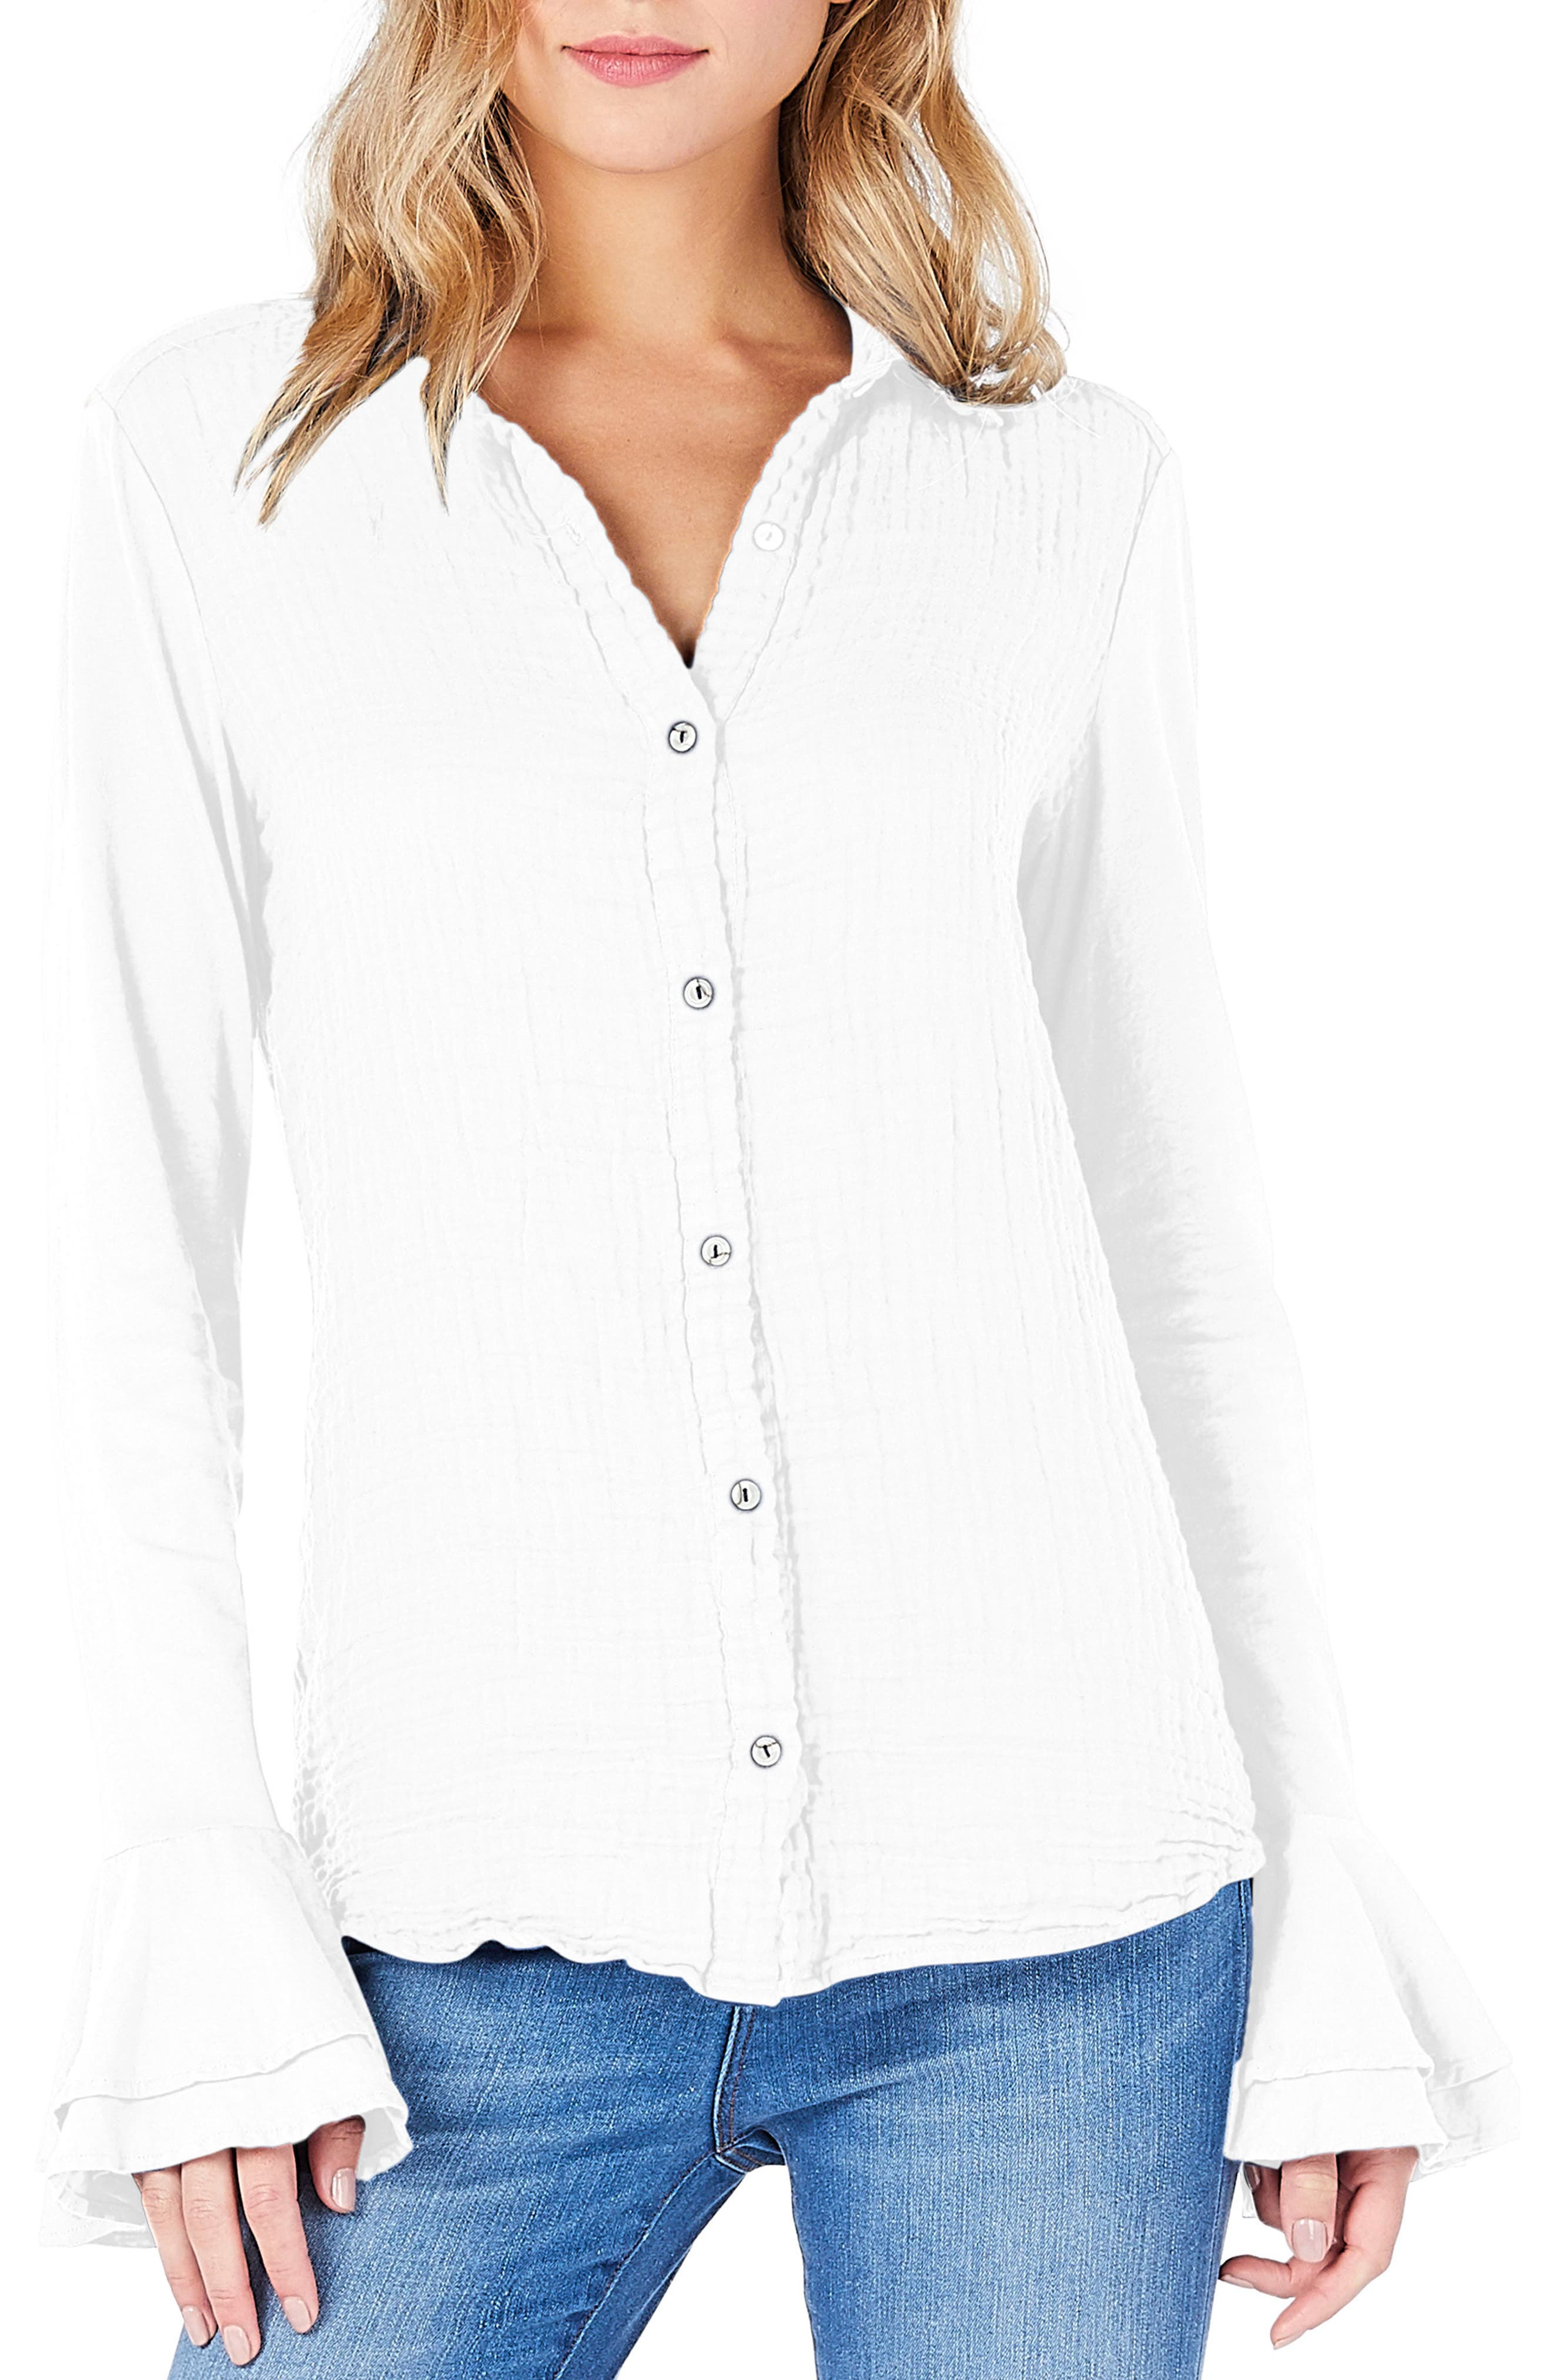 Ruffle Sleeve Shirt,                             Main thumbnail 1, color,                             White